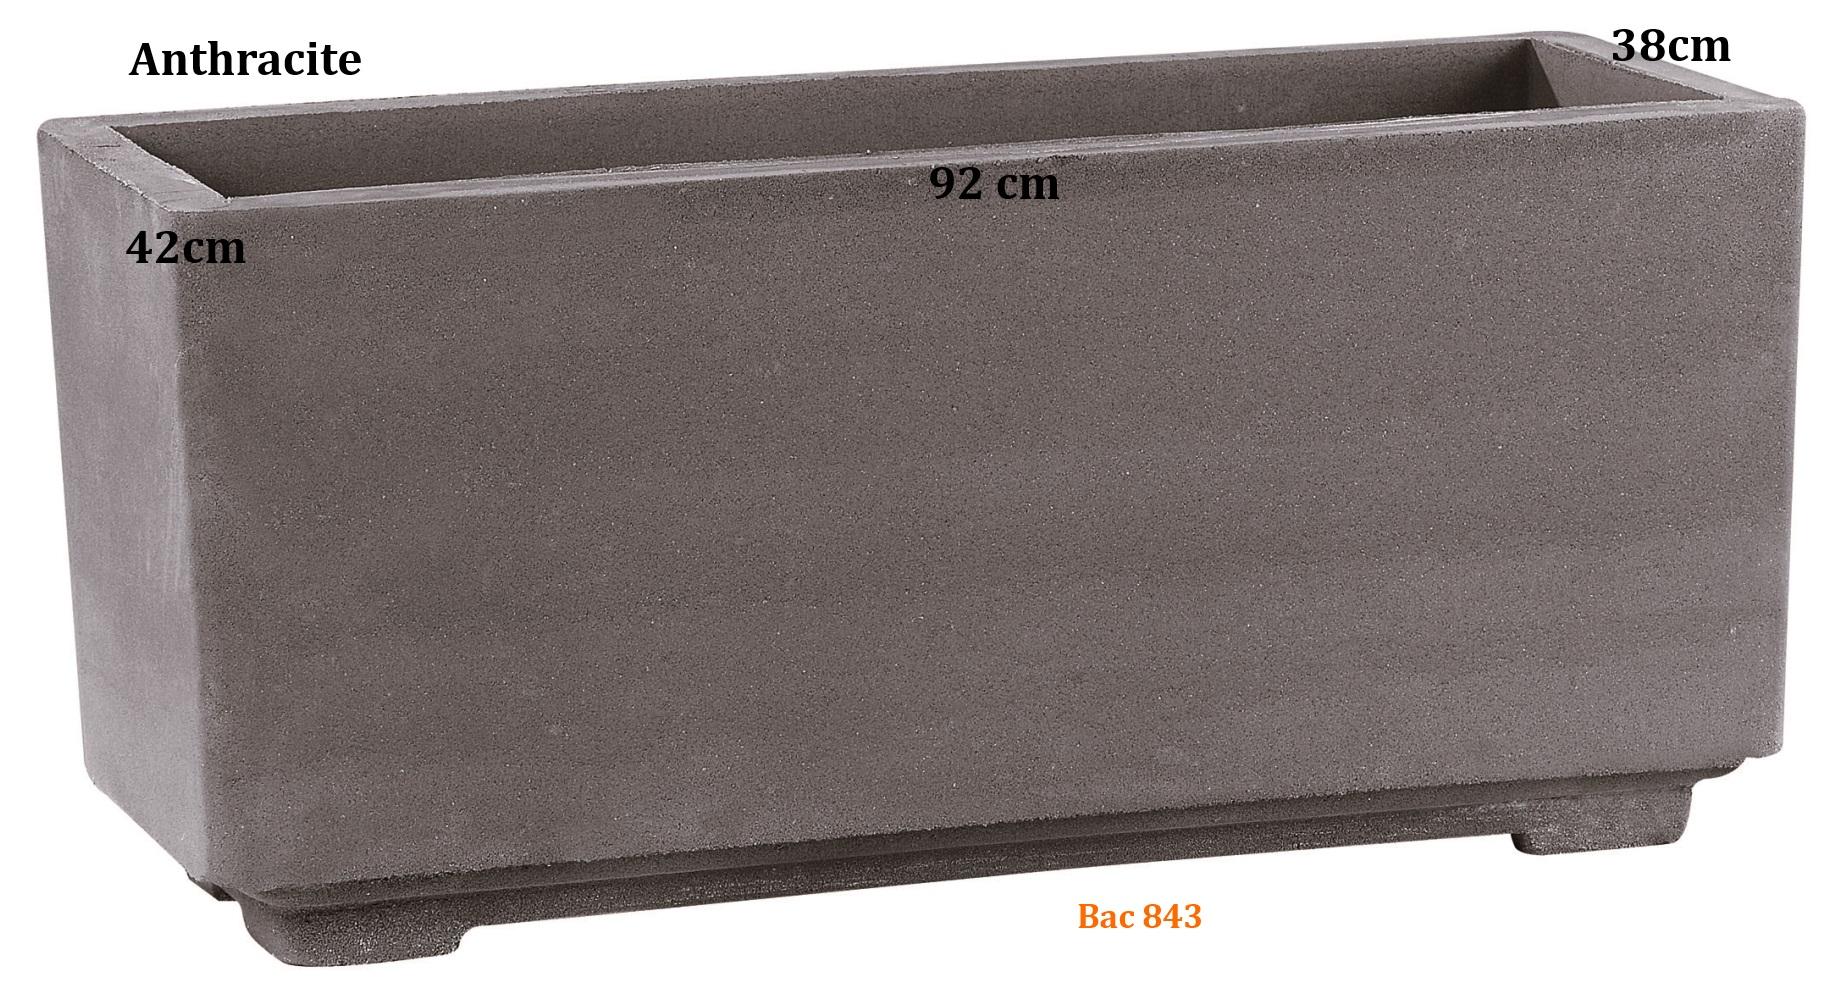 bac 843 béton-anthracite